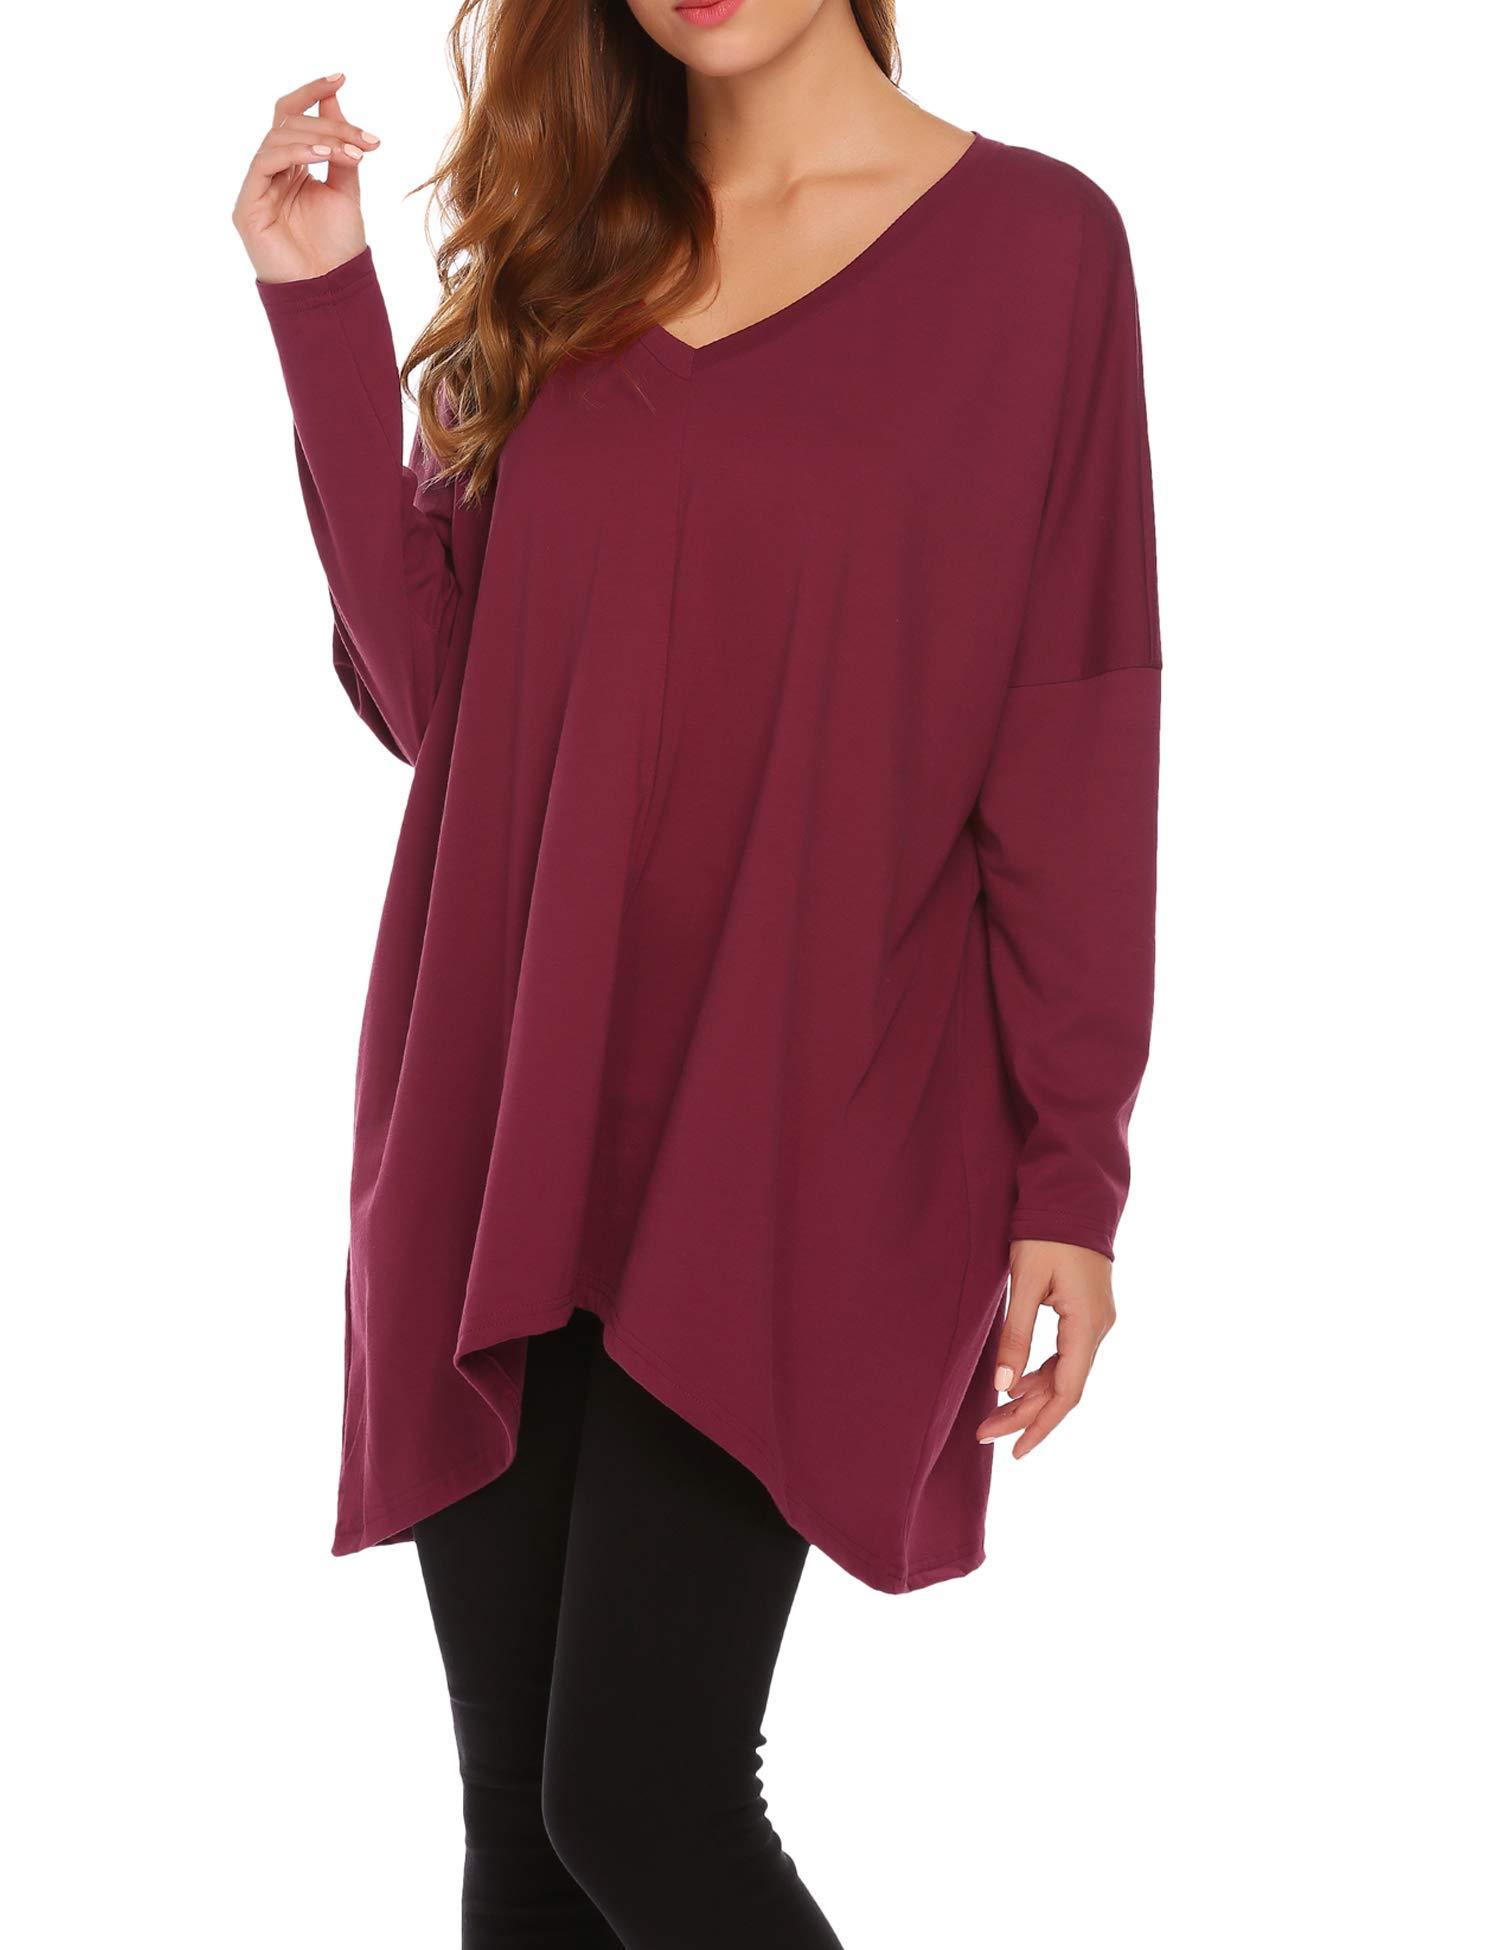 Zeagoo Women's Women Autumn Fashion Oversized Fit Dolman Sleeve Top T-Shirt Wine Red XXL